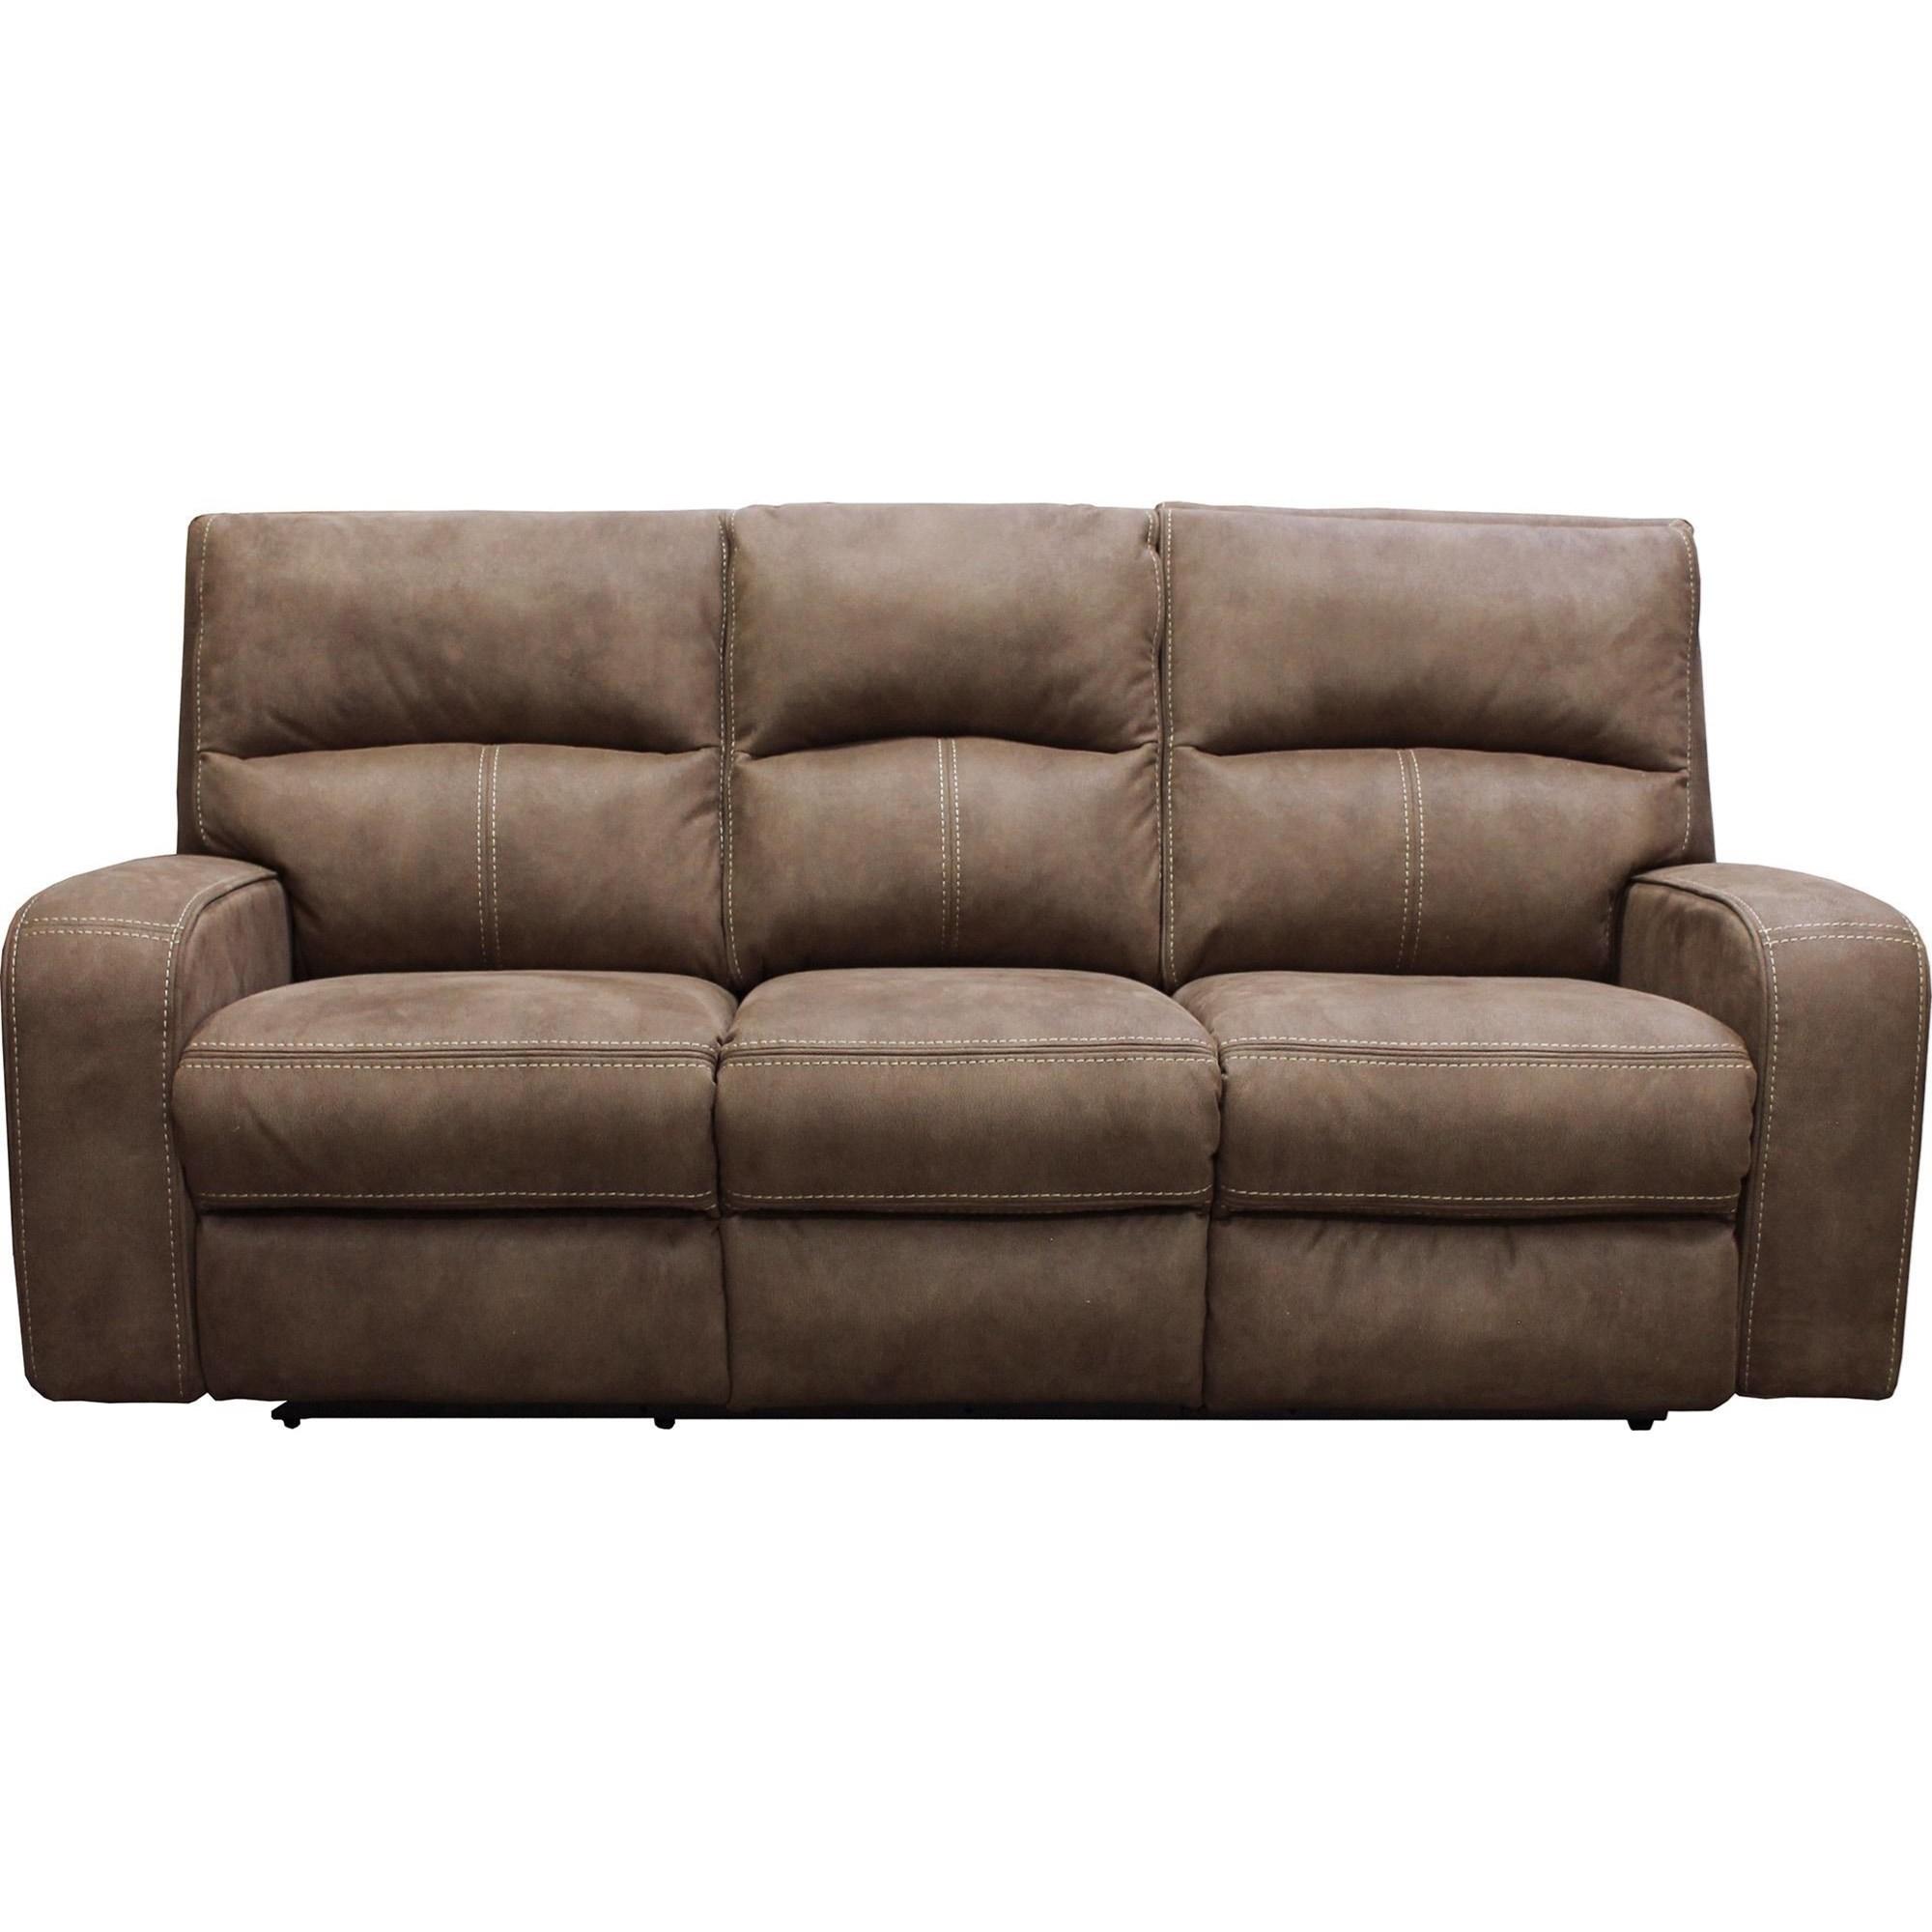 Parker Living Polaris KahluaPower Reclining Sofa With Power Headrest ...